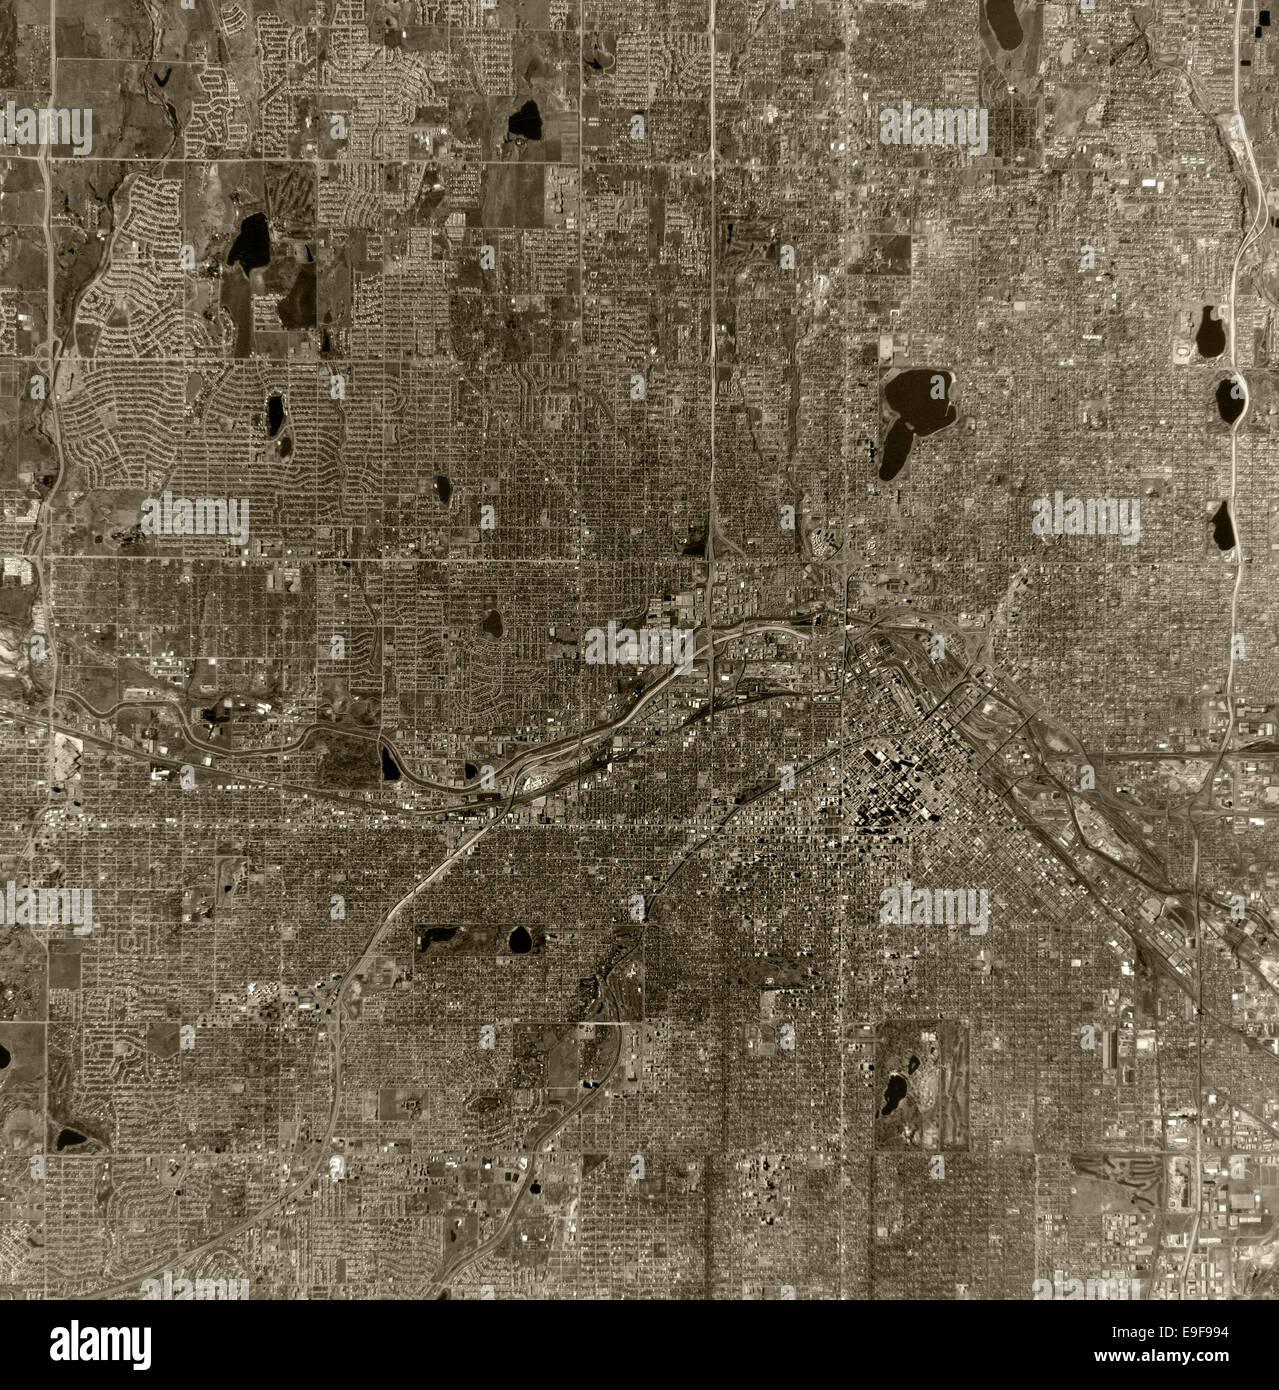 historical aerial photograph Denver, Colorado, 1970 - Stock Image